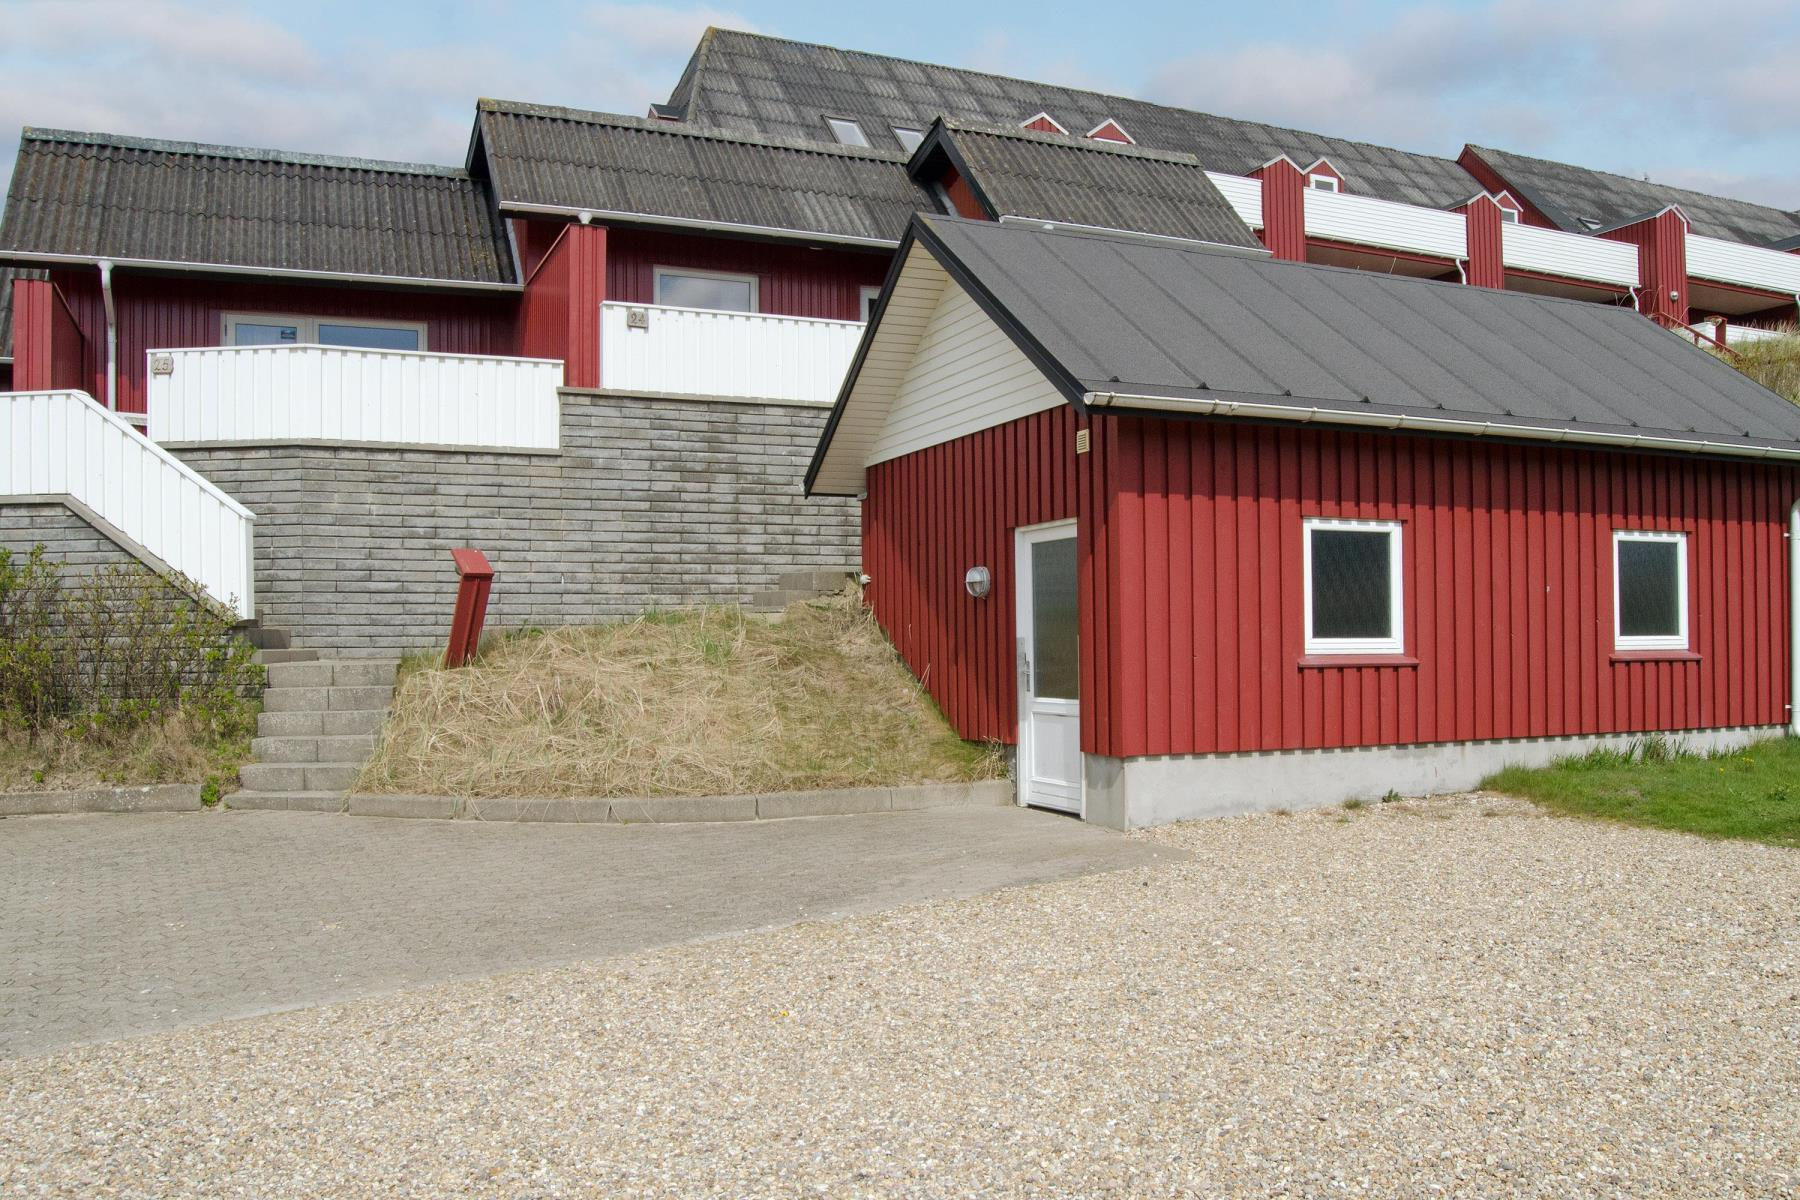 Ferienhaus 1026 - Hjelmevej 15, App. 26